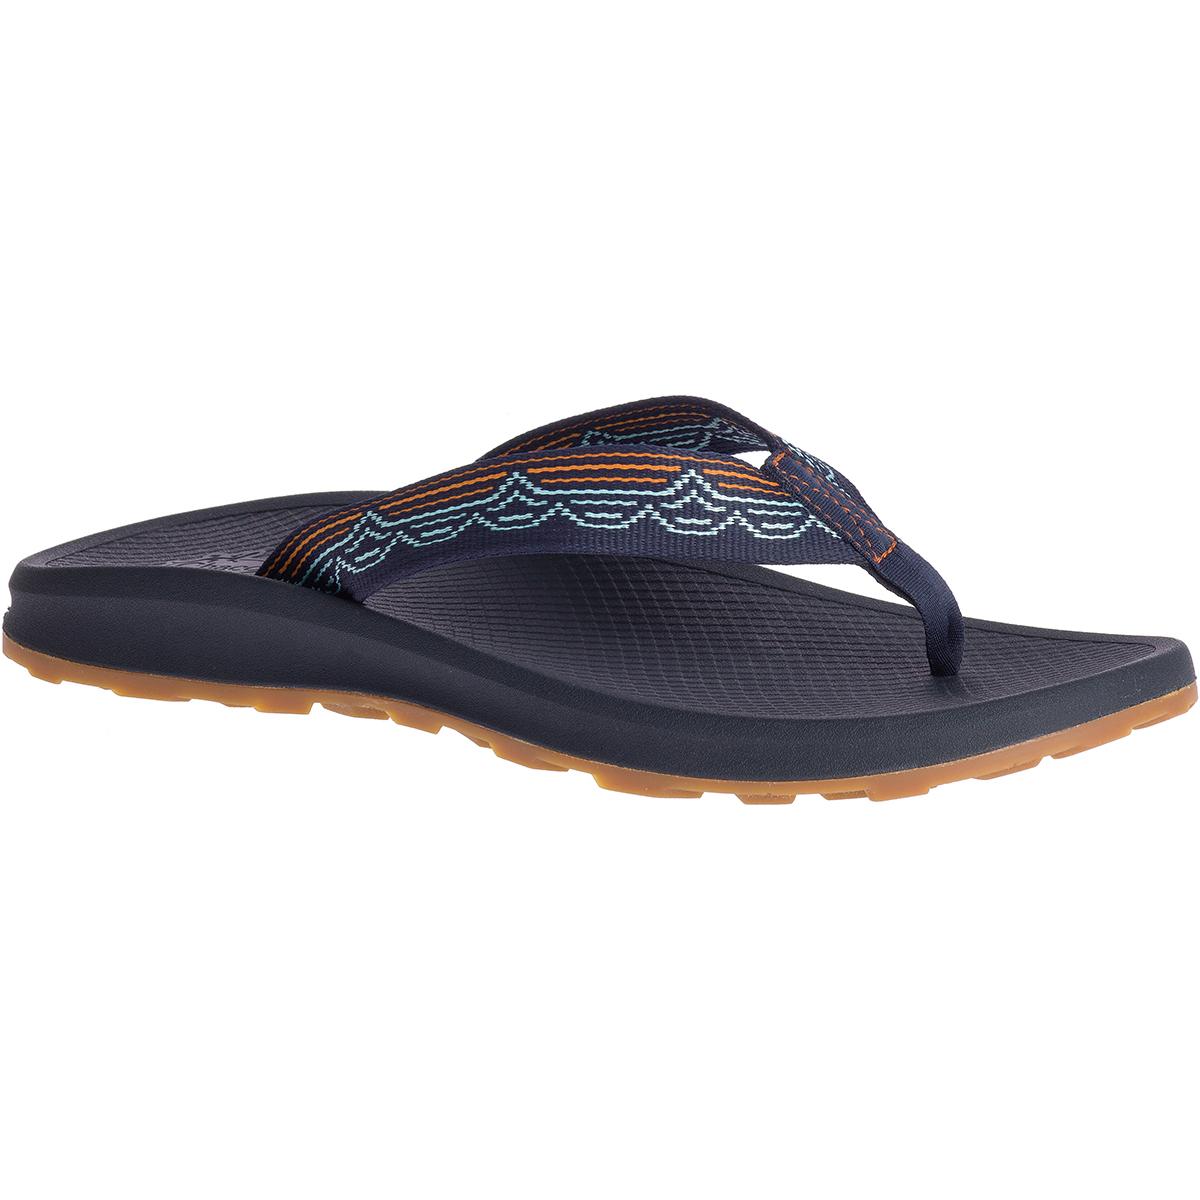 Chaco Men's Playa Pro Web Flip Flops - Blue, 12